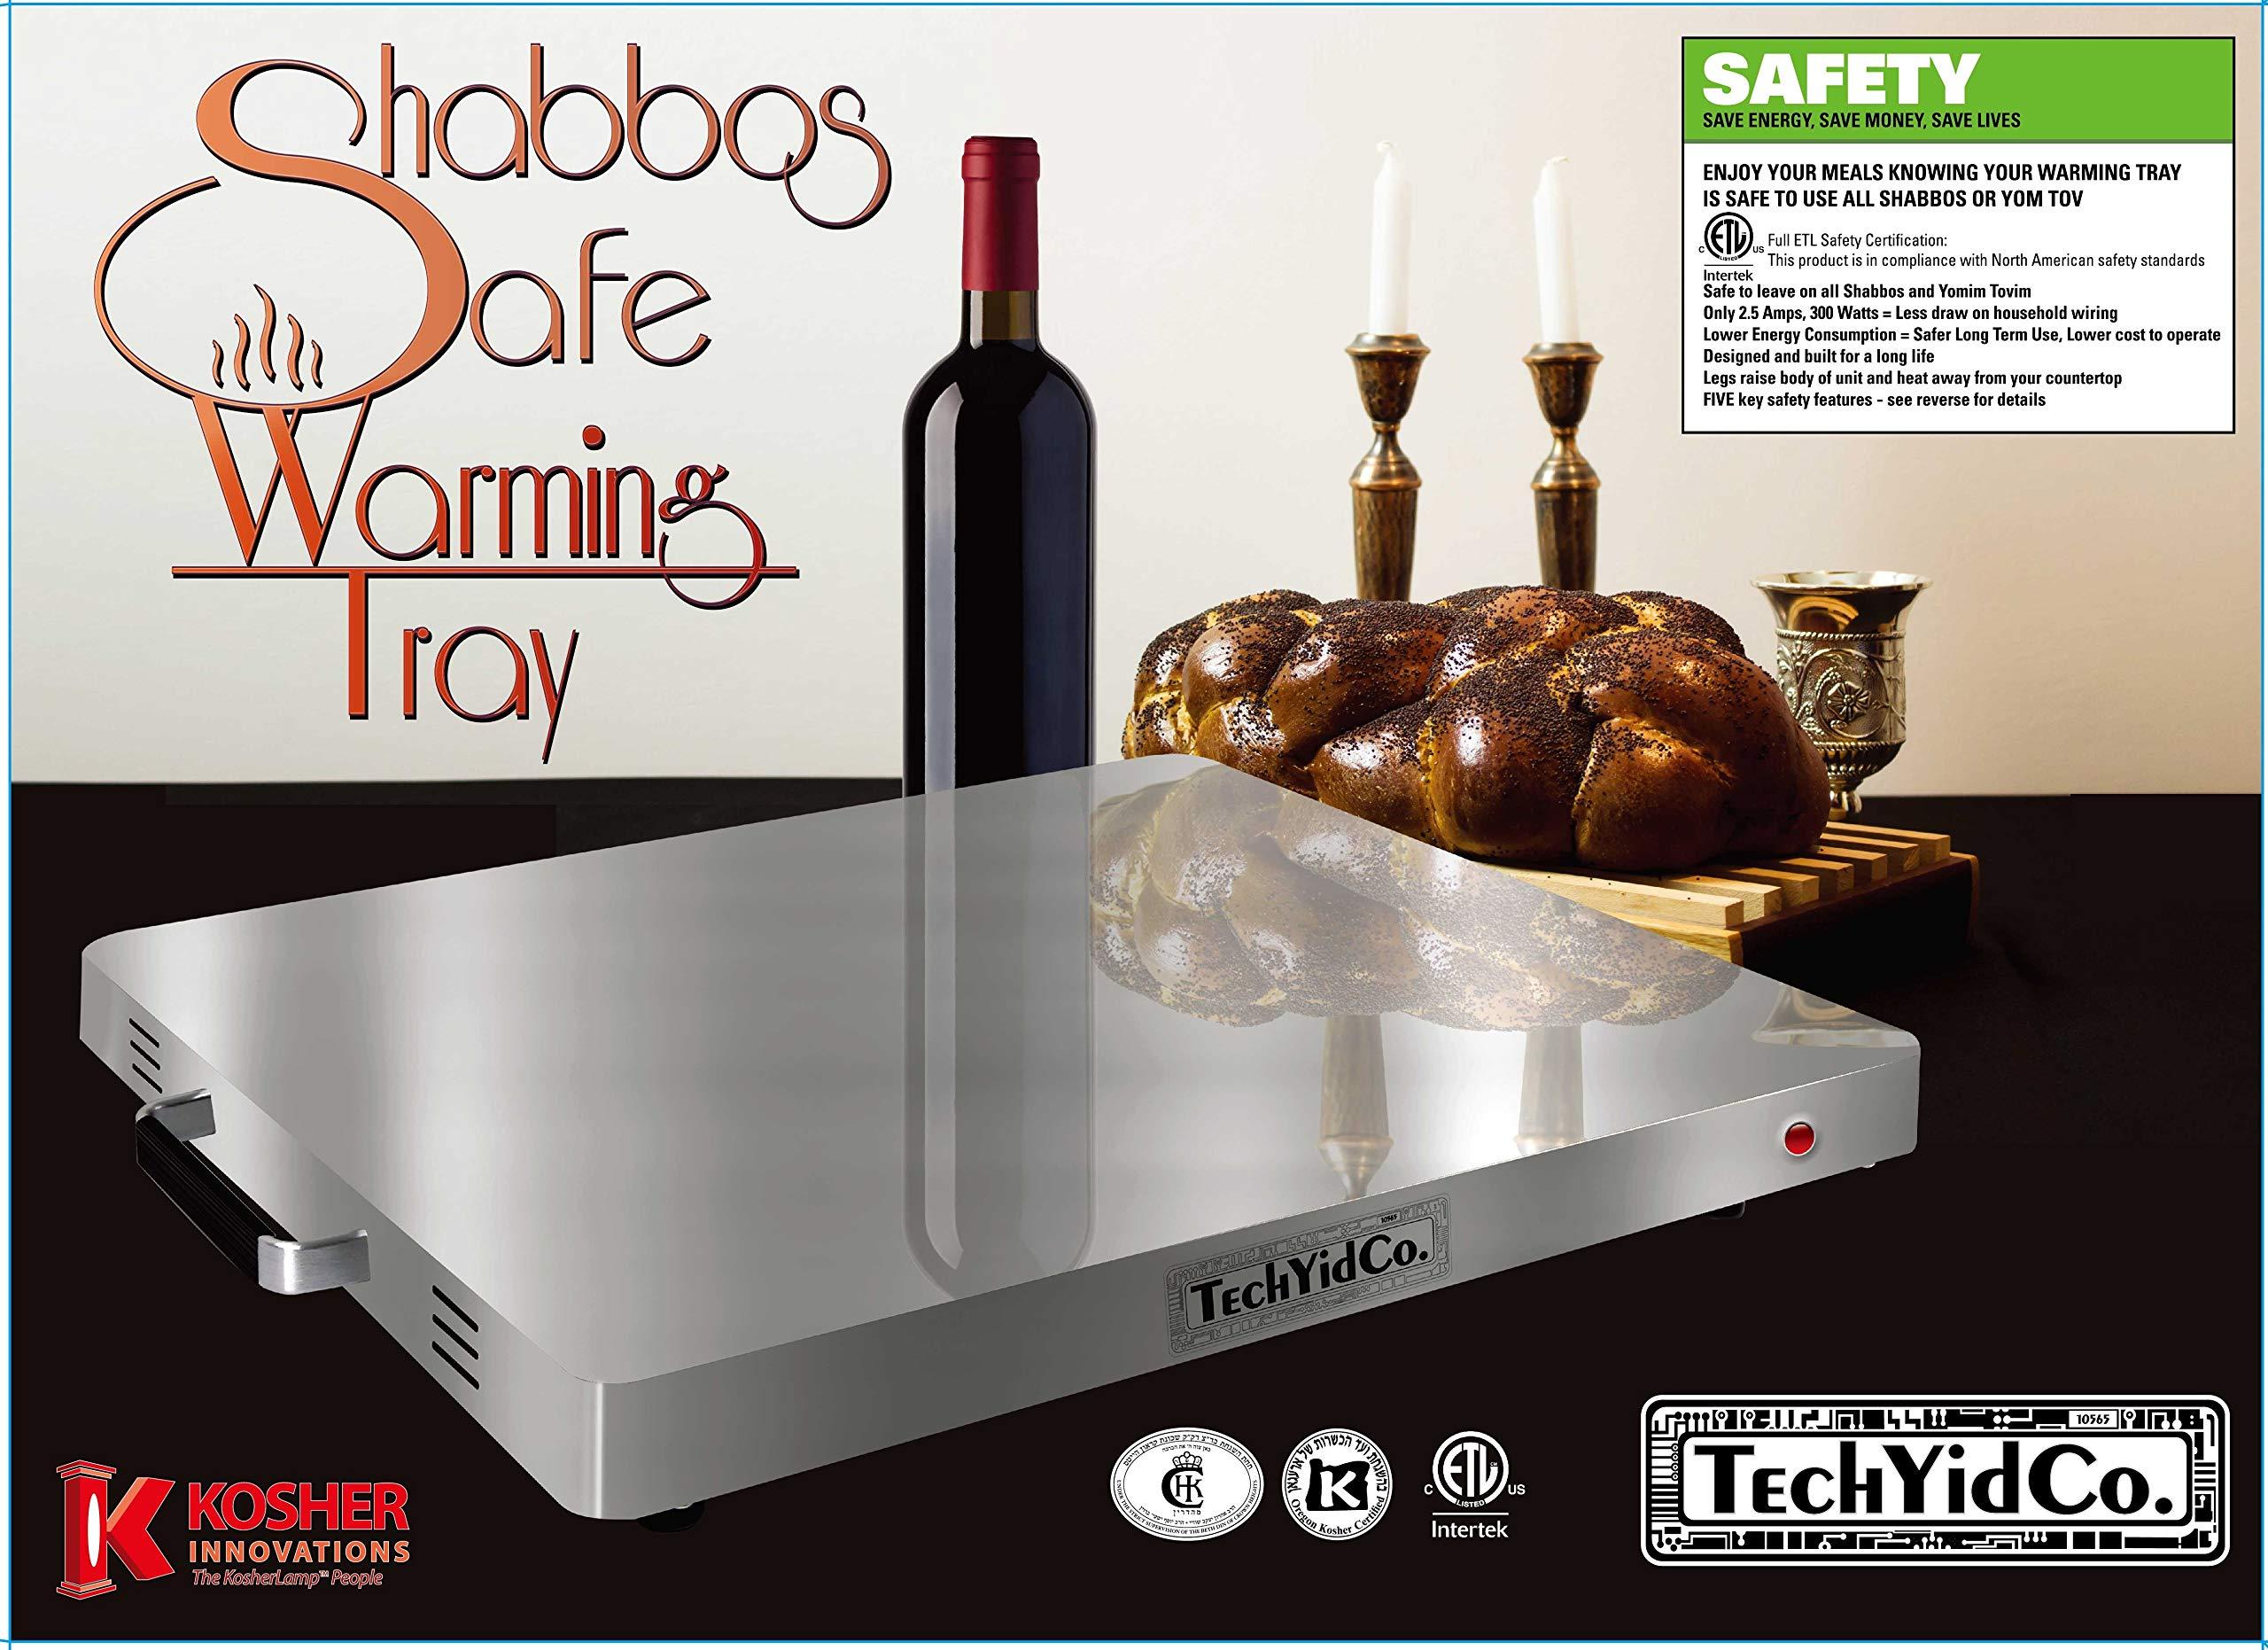 TechYidCo. Shabbos Safe Warming Tray by TECHYIDCO